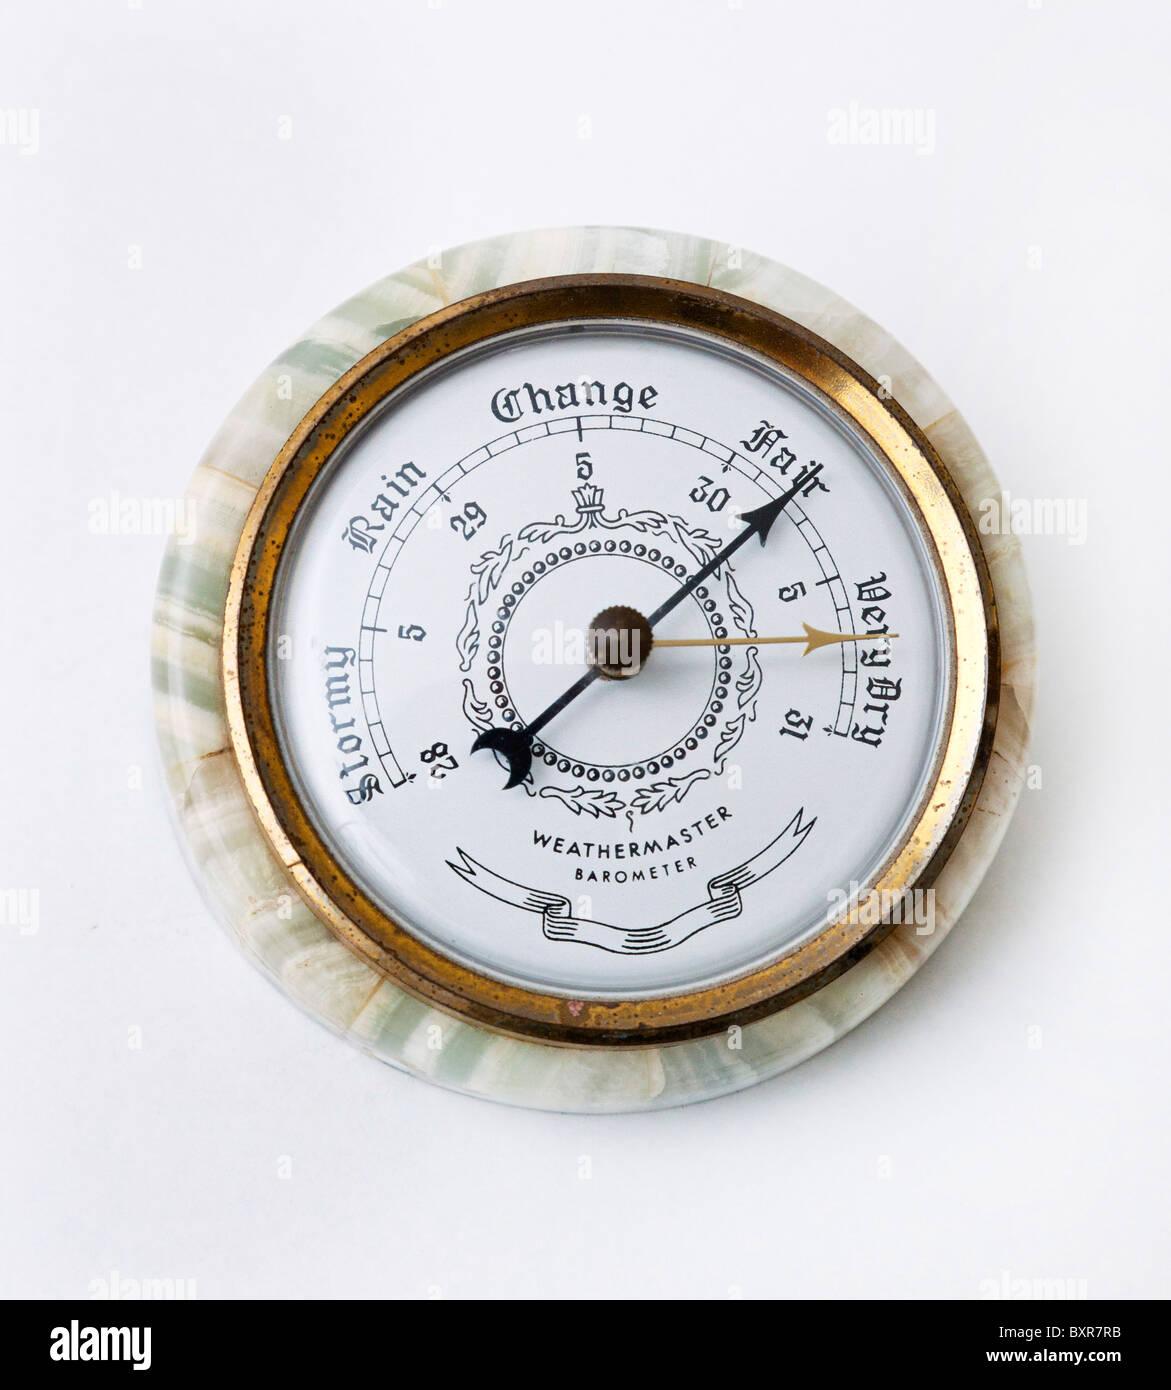 classic aneroid barometer - Stock Image